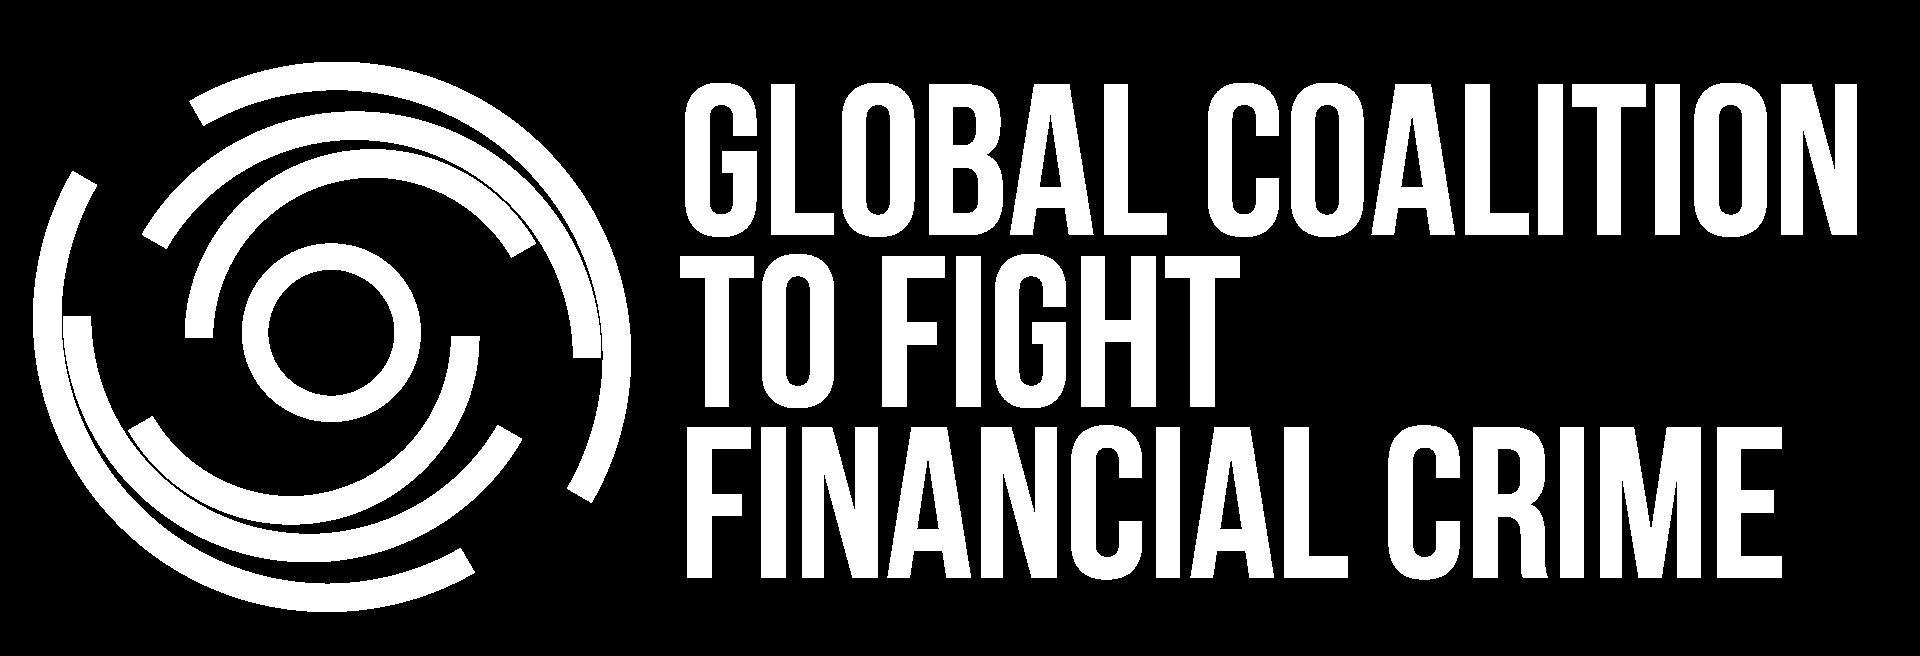 GCFFC.org